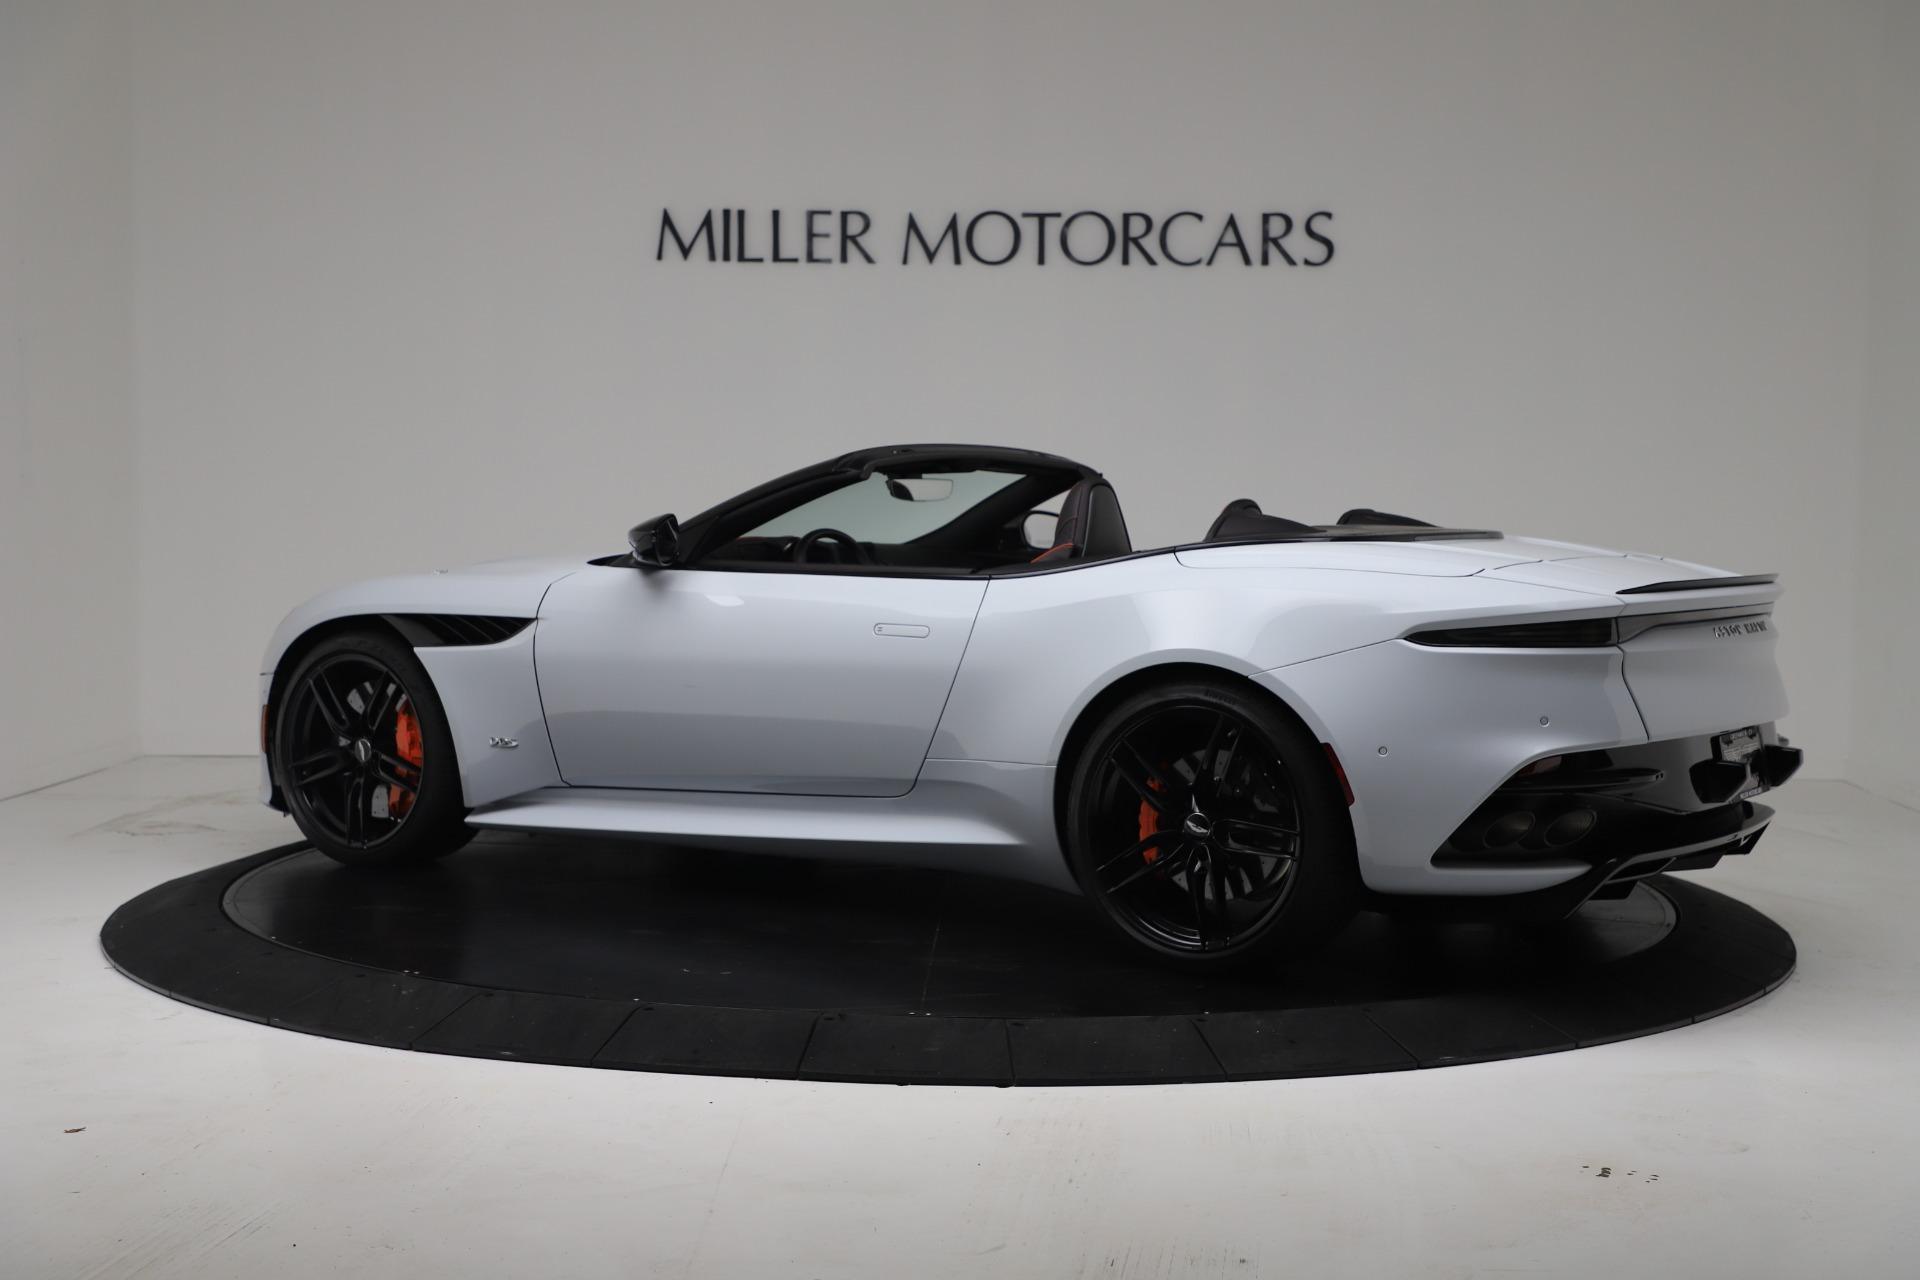 New 2020 Aston Martin DBS Superleggera For Sale In Greenwich, CT 3484_p3